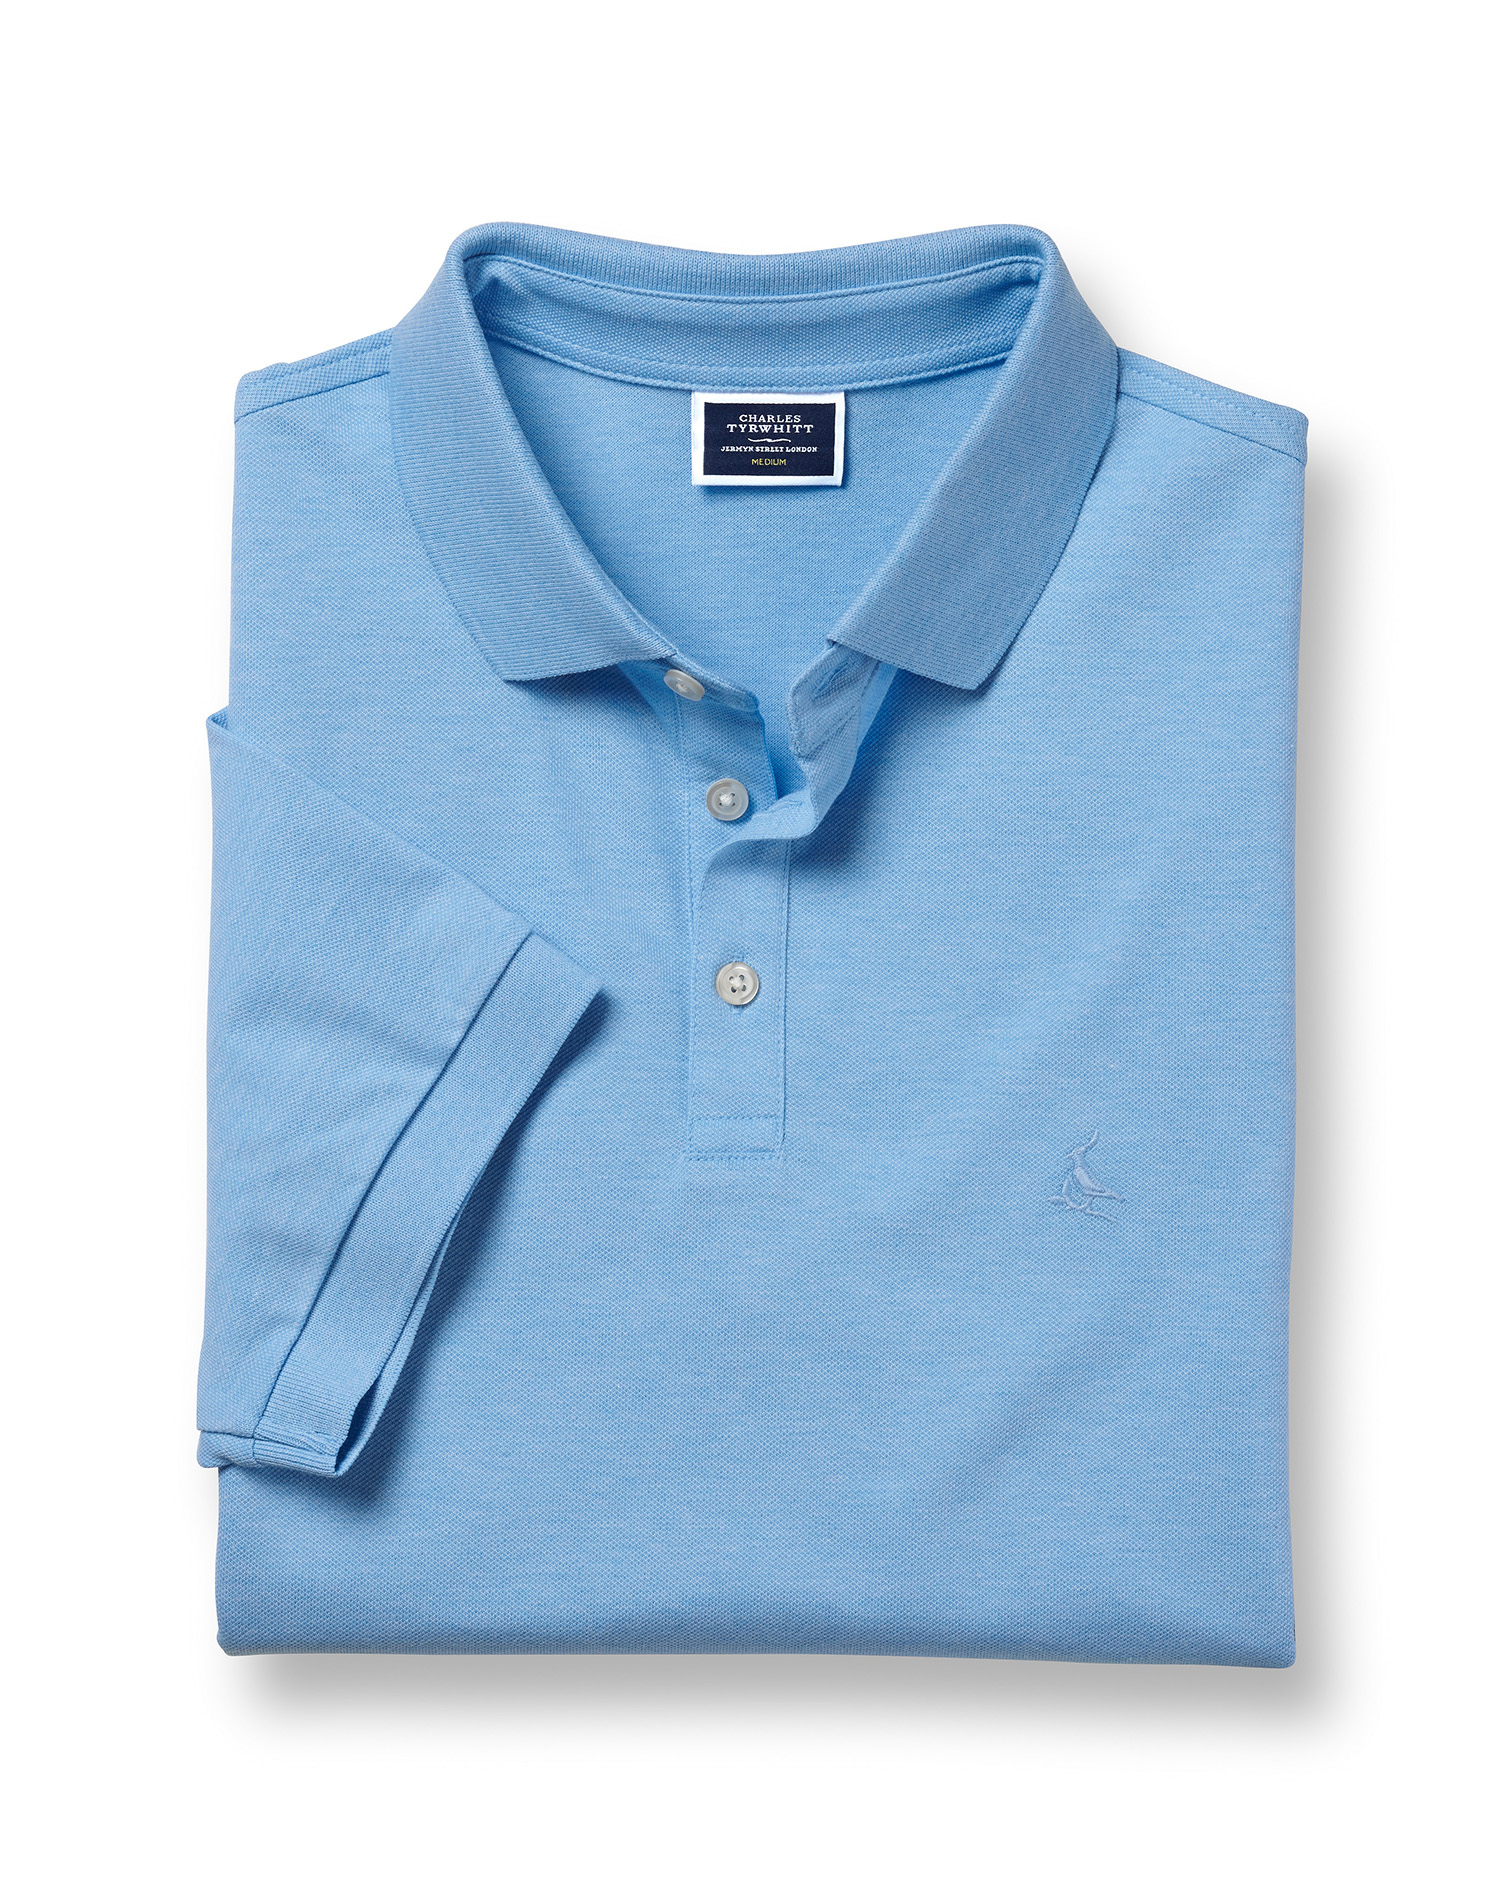 Polo Tyrwhitt En Piqué - Bleu Ciel - S par Charles Tyrwhitt